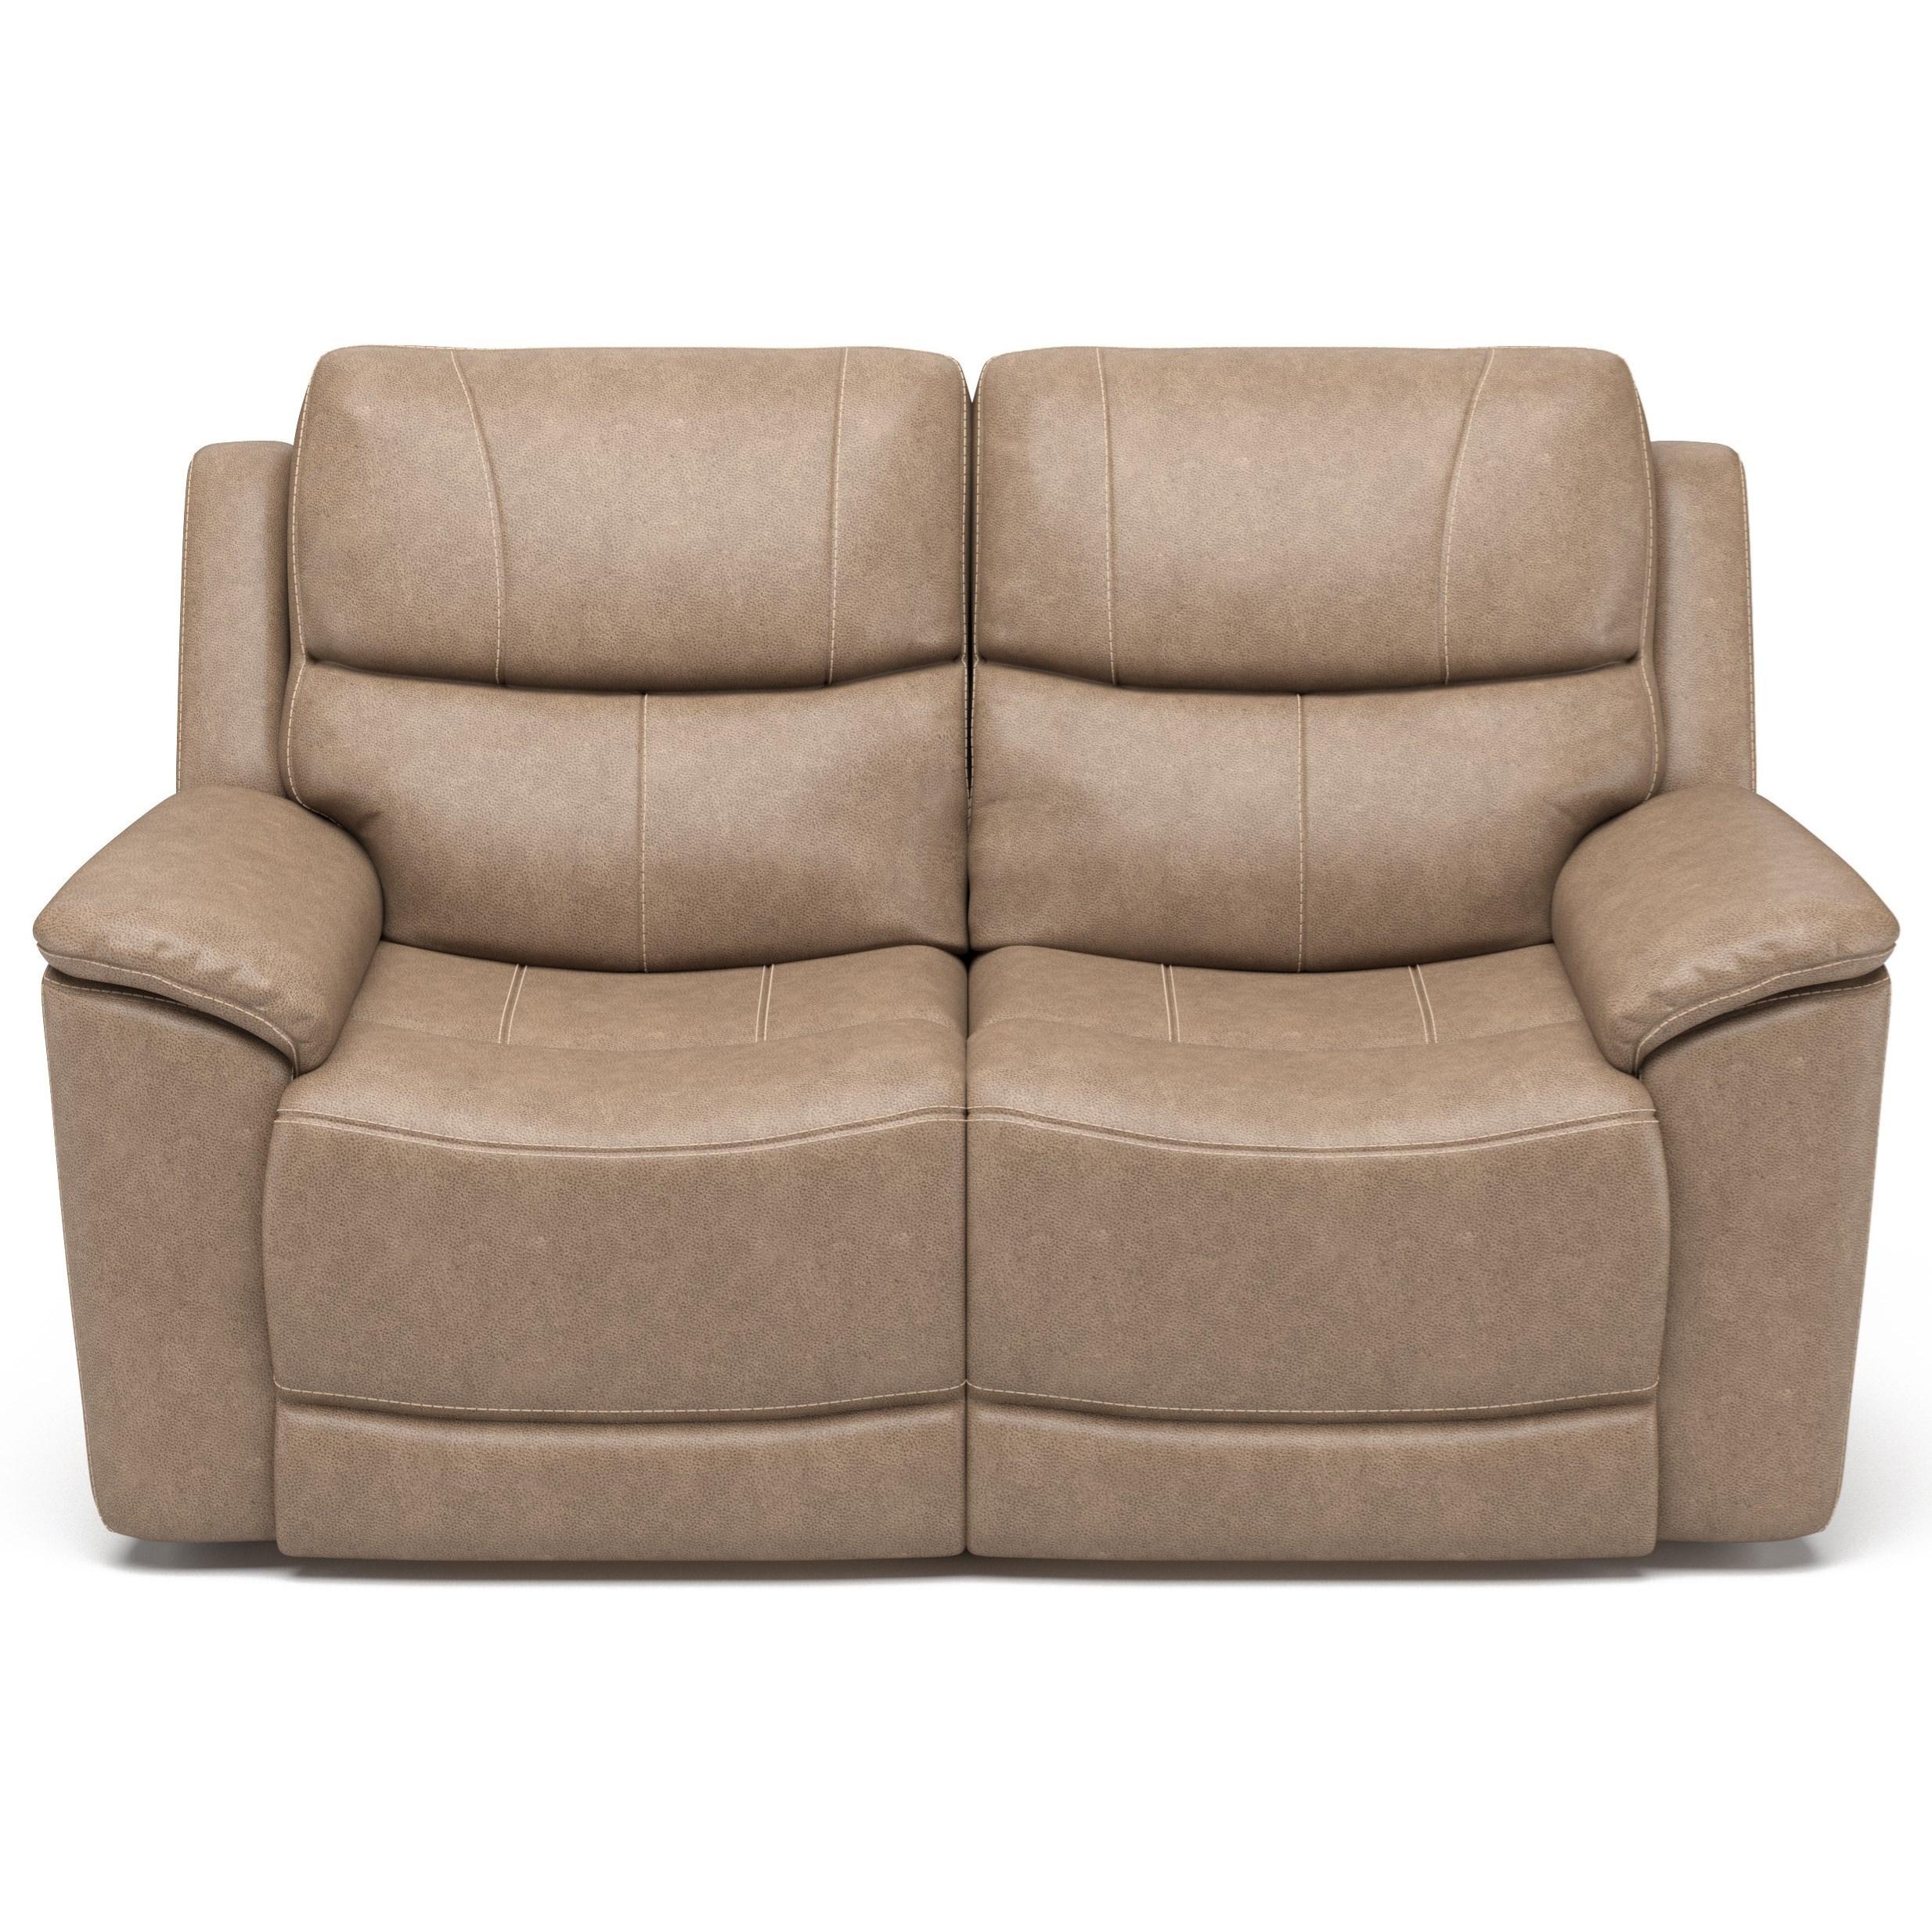 Latitudes - Cade Power Reclining Love Seat by Flexsteel at Walker's Furniture